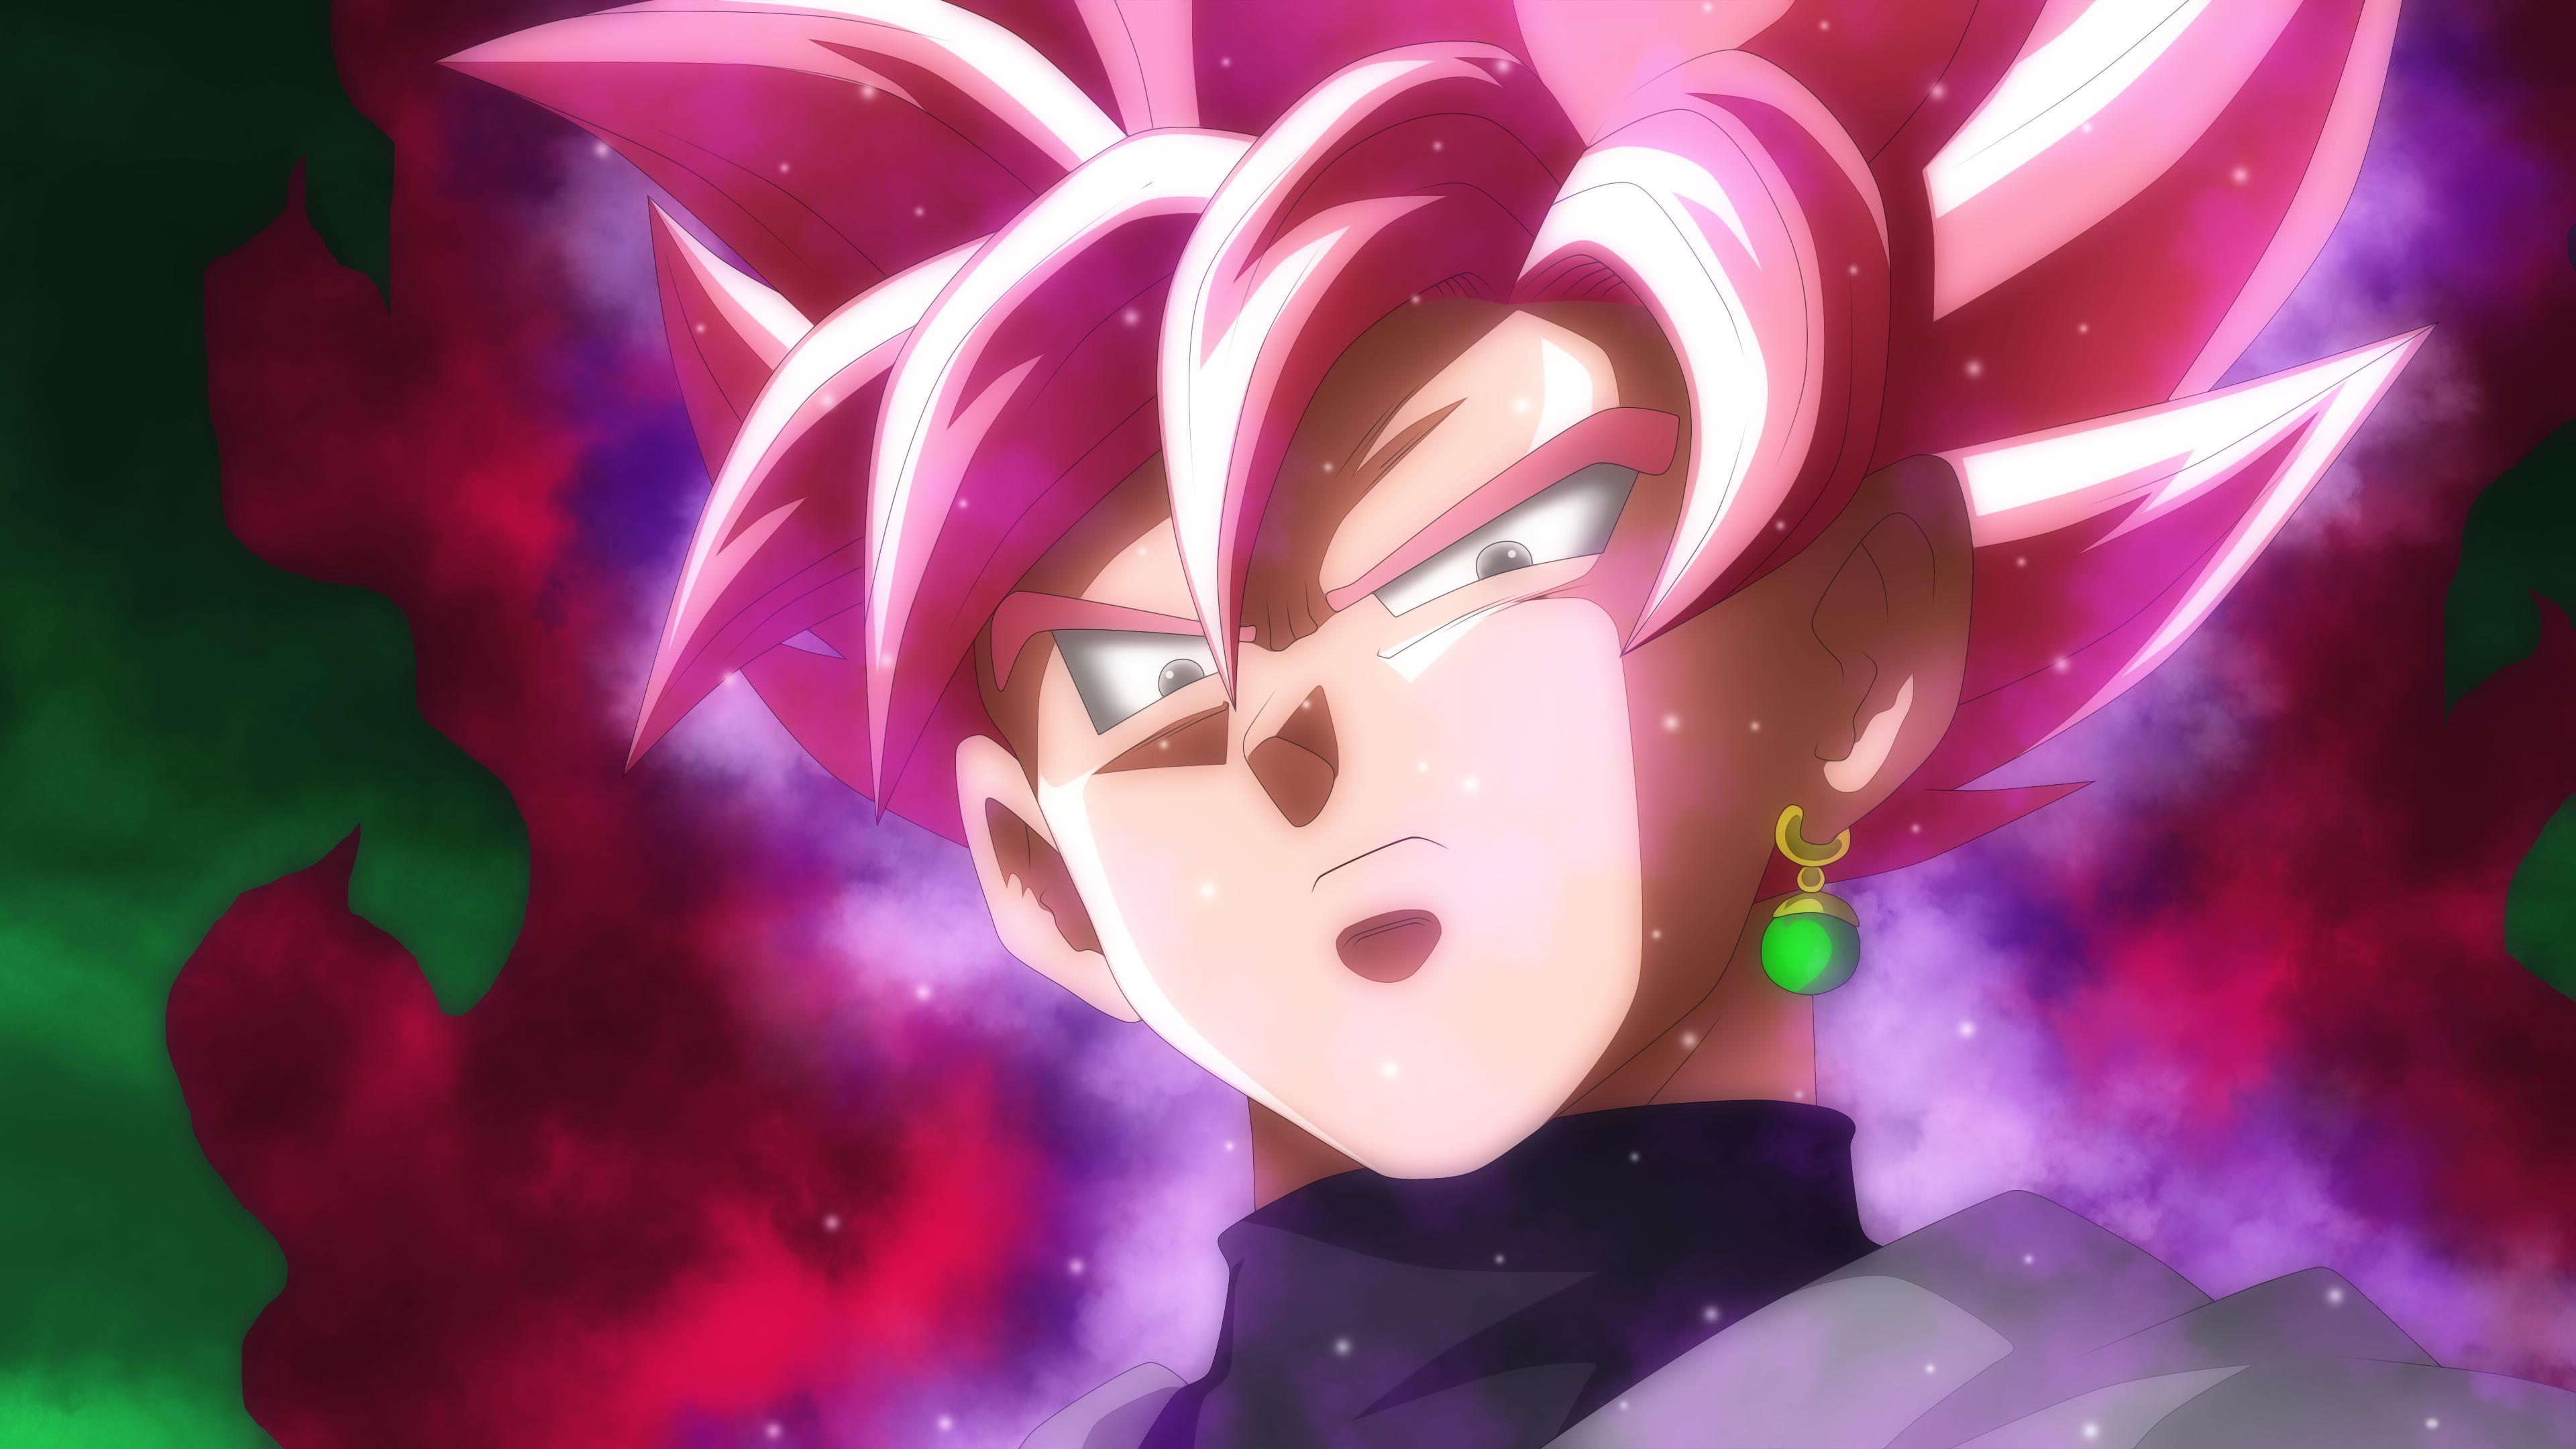 Anime 3840x2160 Dragon Ball Super Super Saiyajin Rosé Super Saiyan Rosé Black Goku Dragon Ball Goku Black